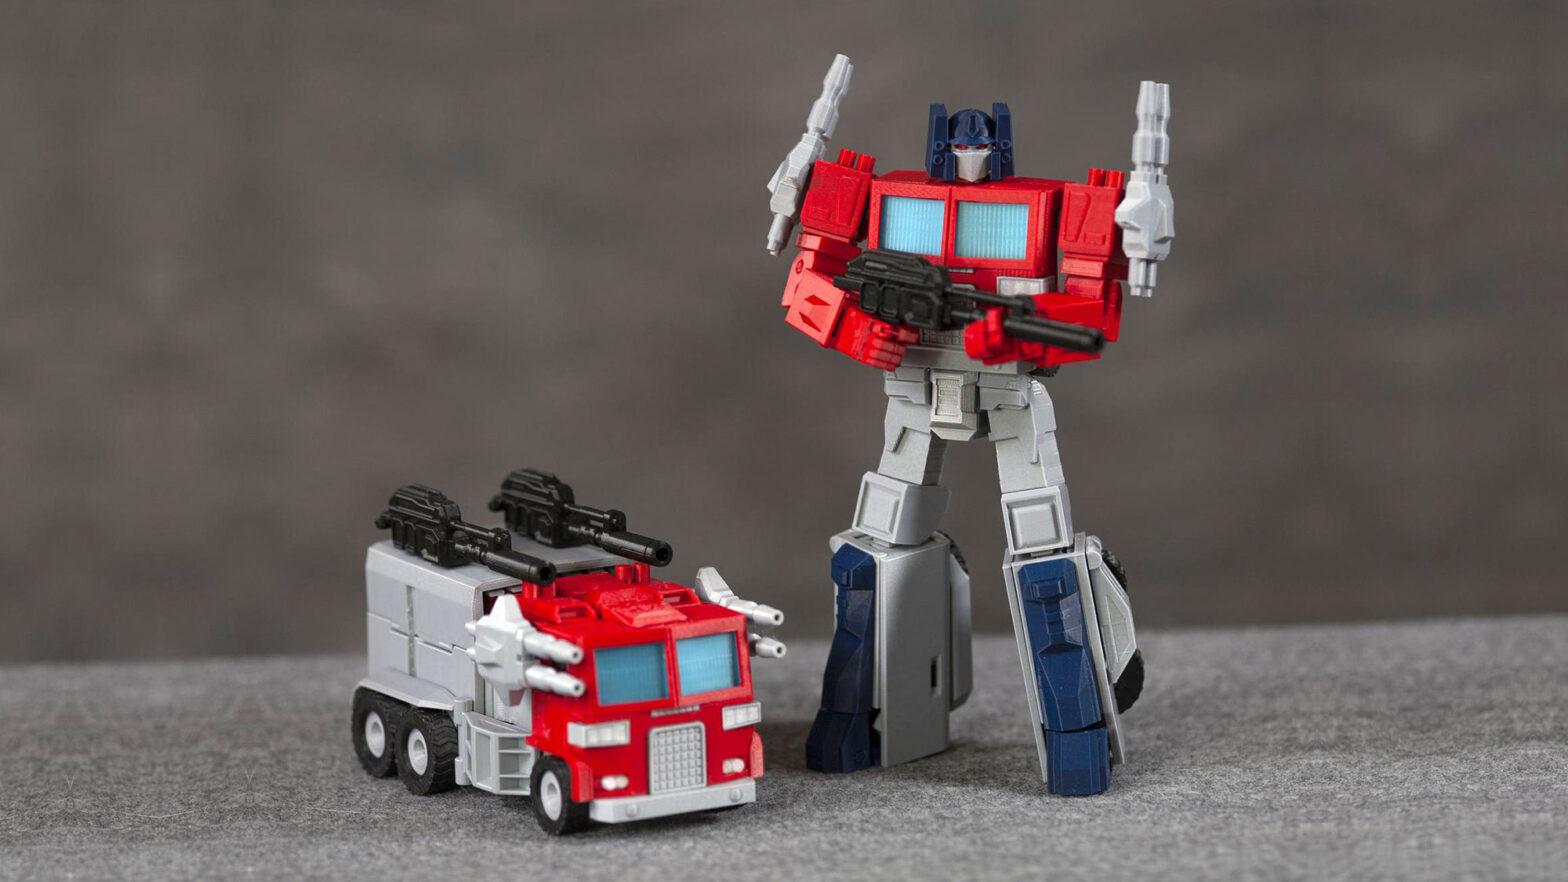 Marvel-inspired Transformers Optimus Prime Figure